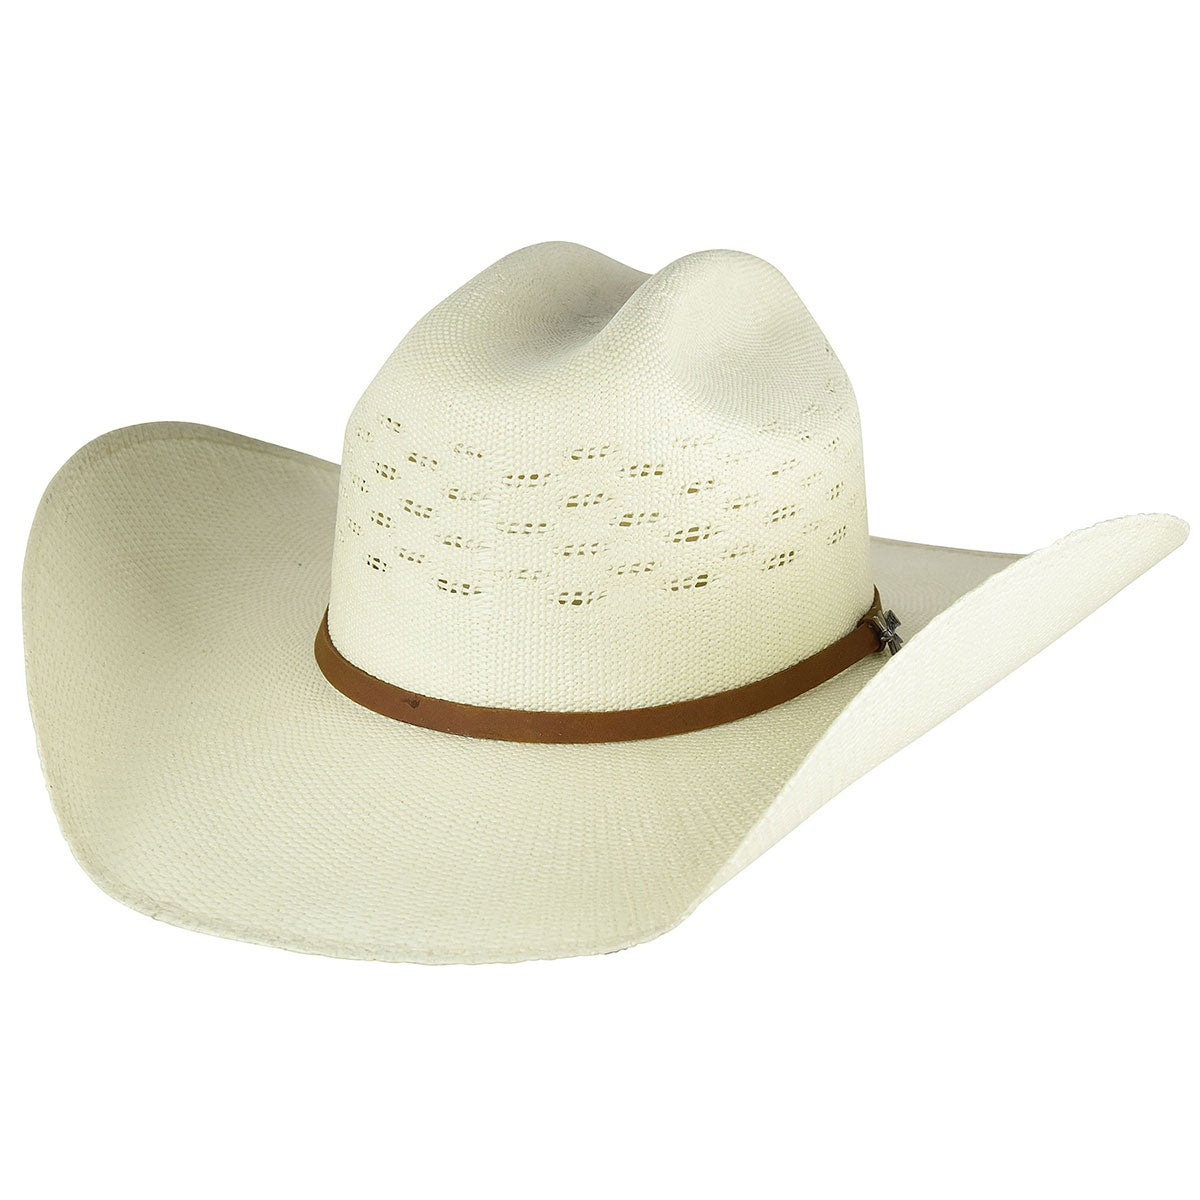 Bailey Western Big Bend Bangora Western Hat in Ivory